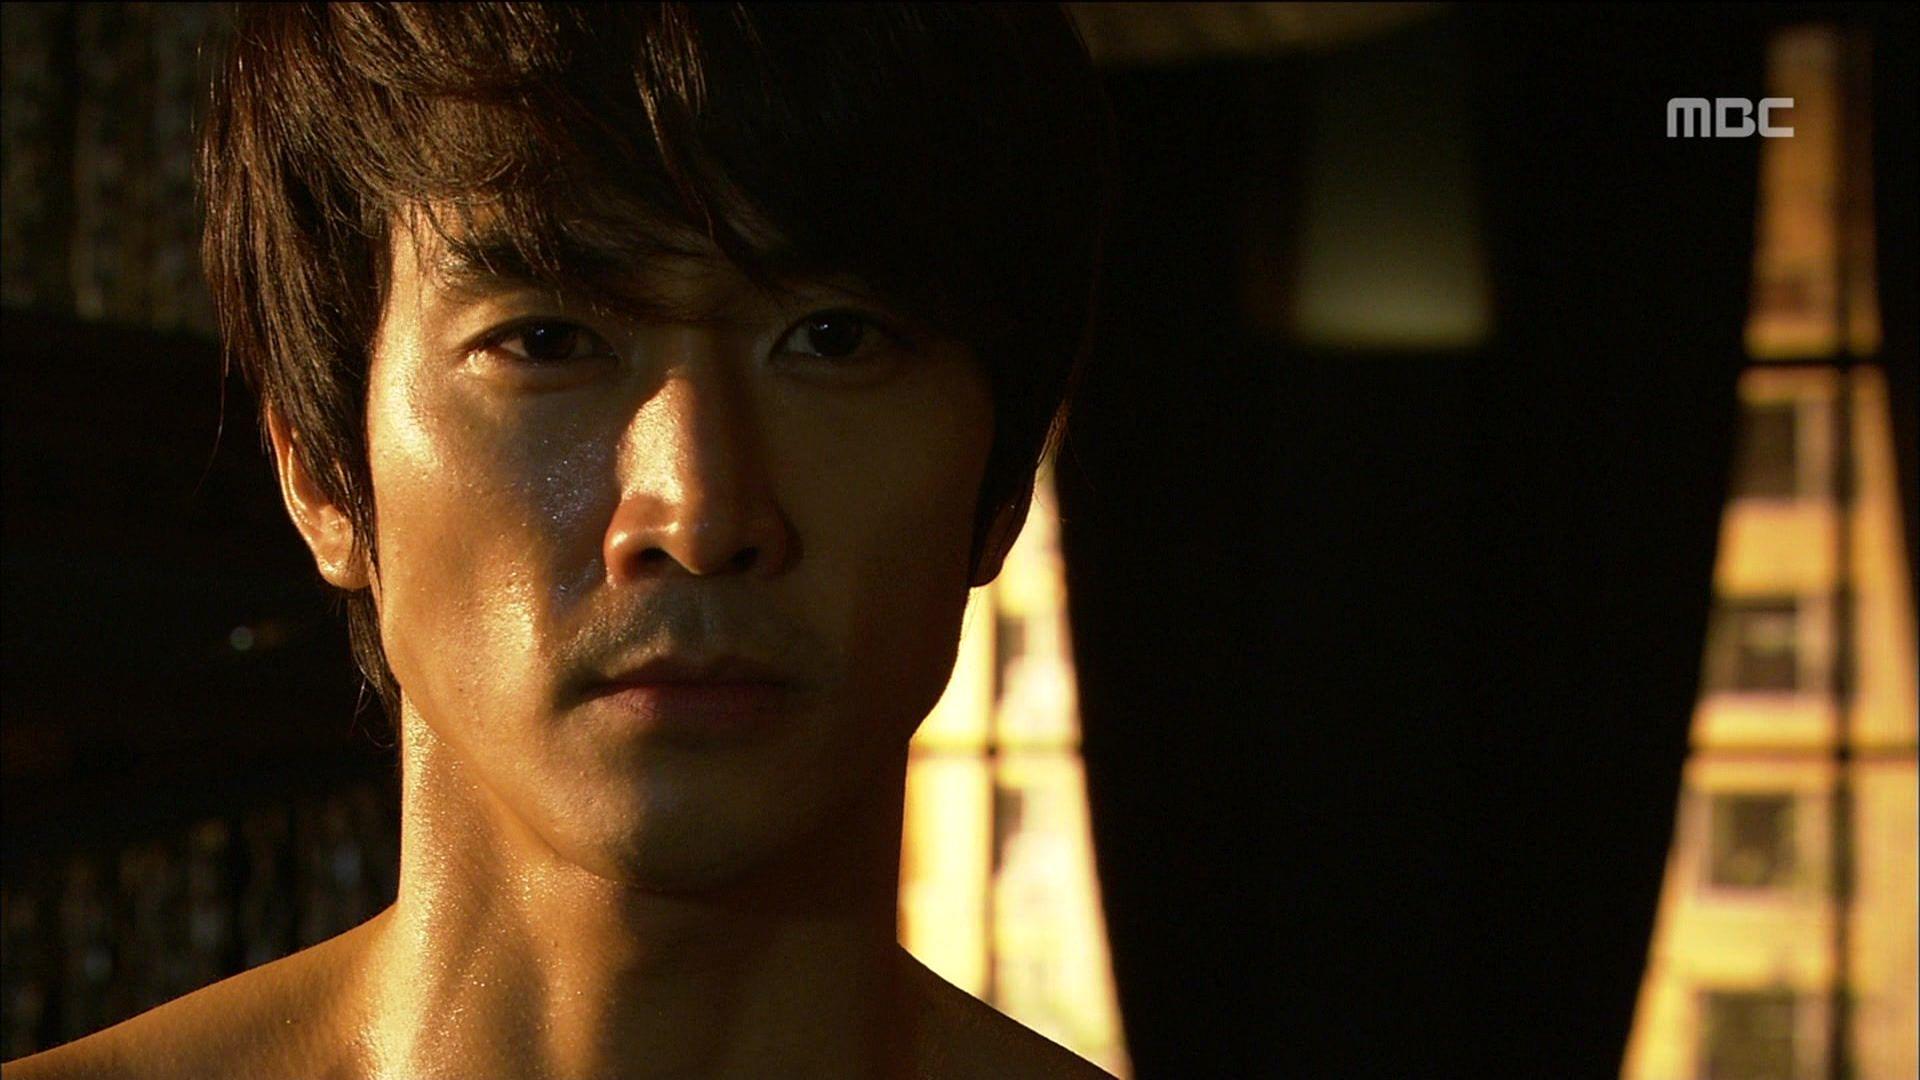 Drama 2013] When A Man Loves 남자가 사랑할 때 - Page 19 - k-dramas ...